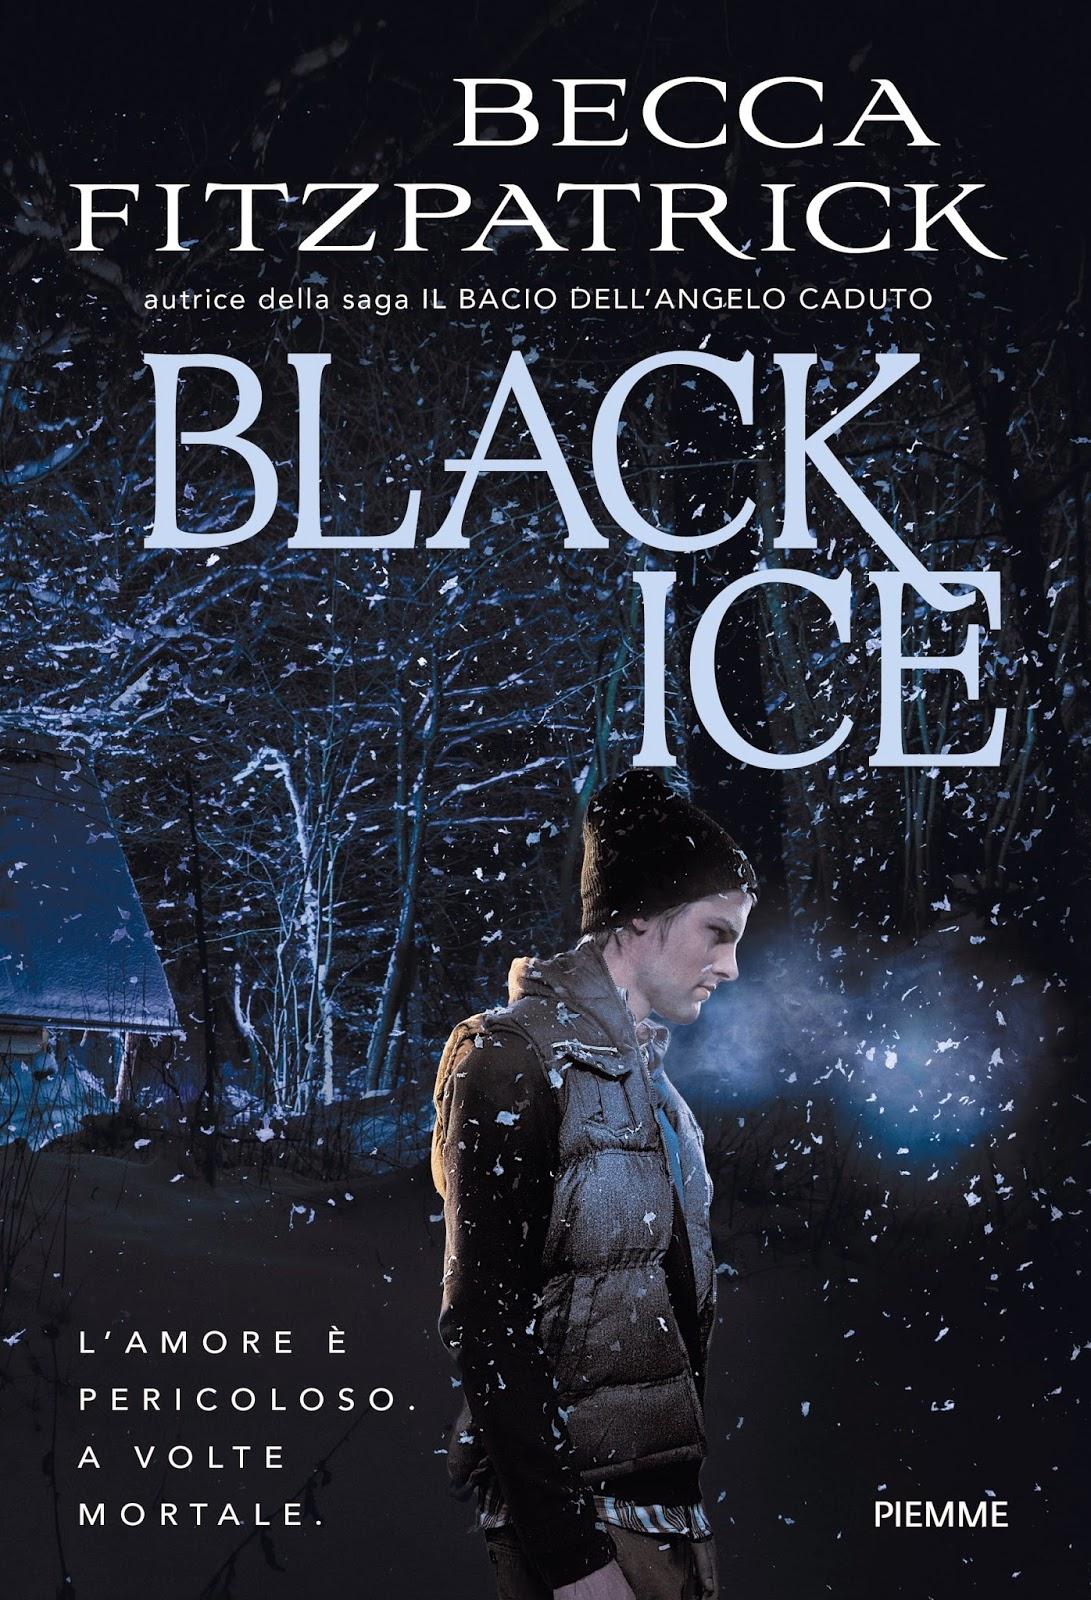 Black Ice Book Cover Model : Becca fitzpatrick black ice